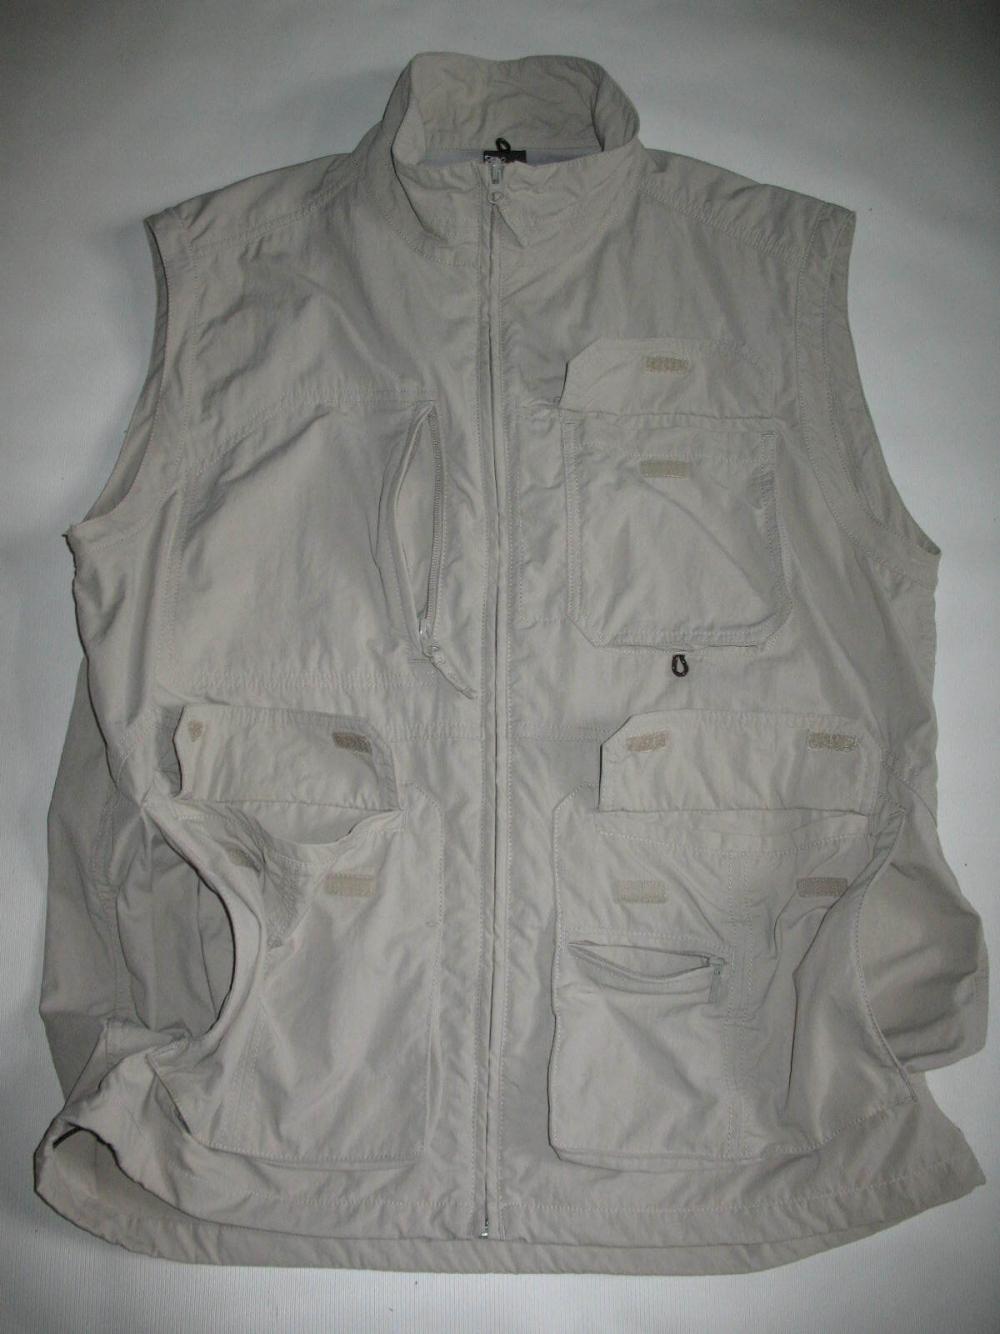 Жилет SALEWA quartz 5c dryton vest (размер 52-XL) - 7